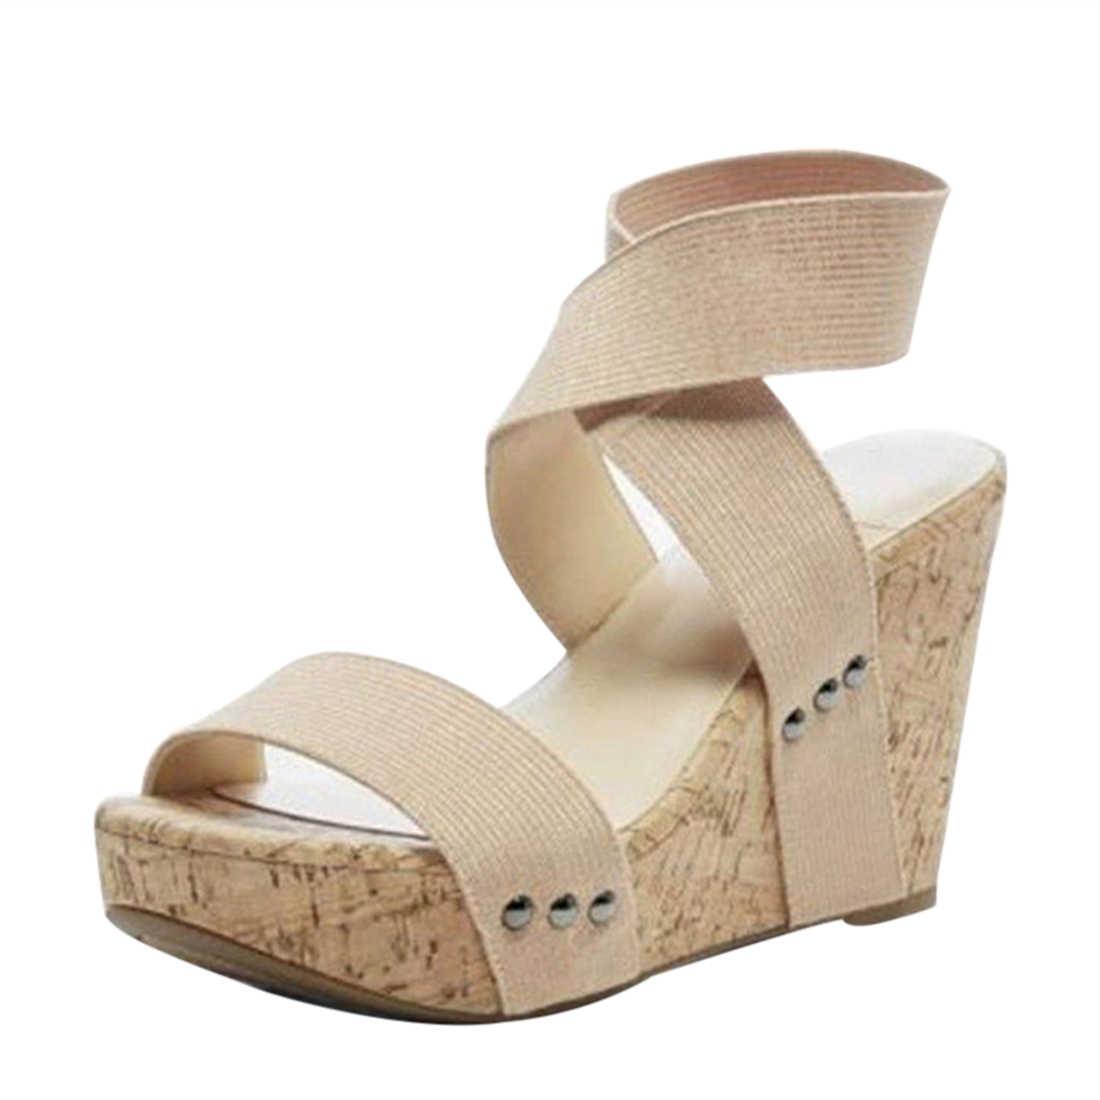 67b18975b0 ... HEFLASHOR Women Sandals Summer Shoes Wedges Elastic Band Sandals Women  Casual Ladies Platform Sandals Womens Shoes ...